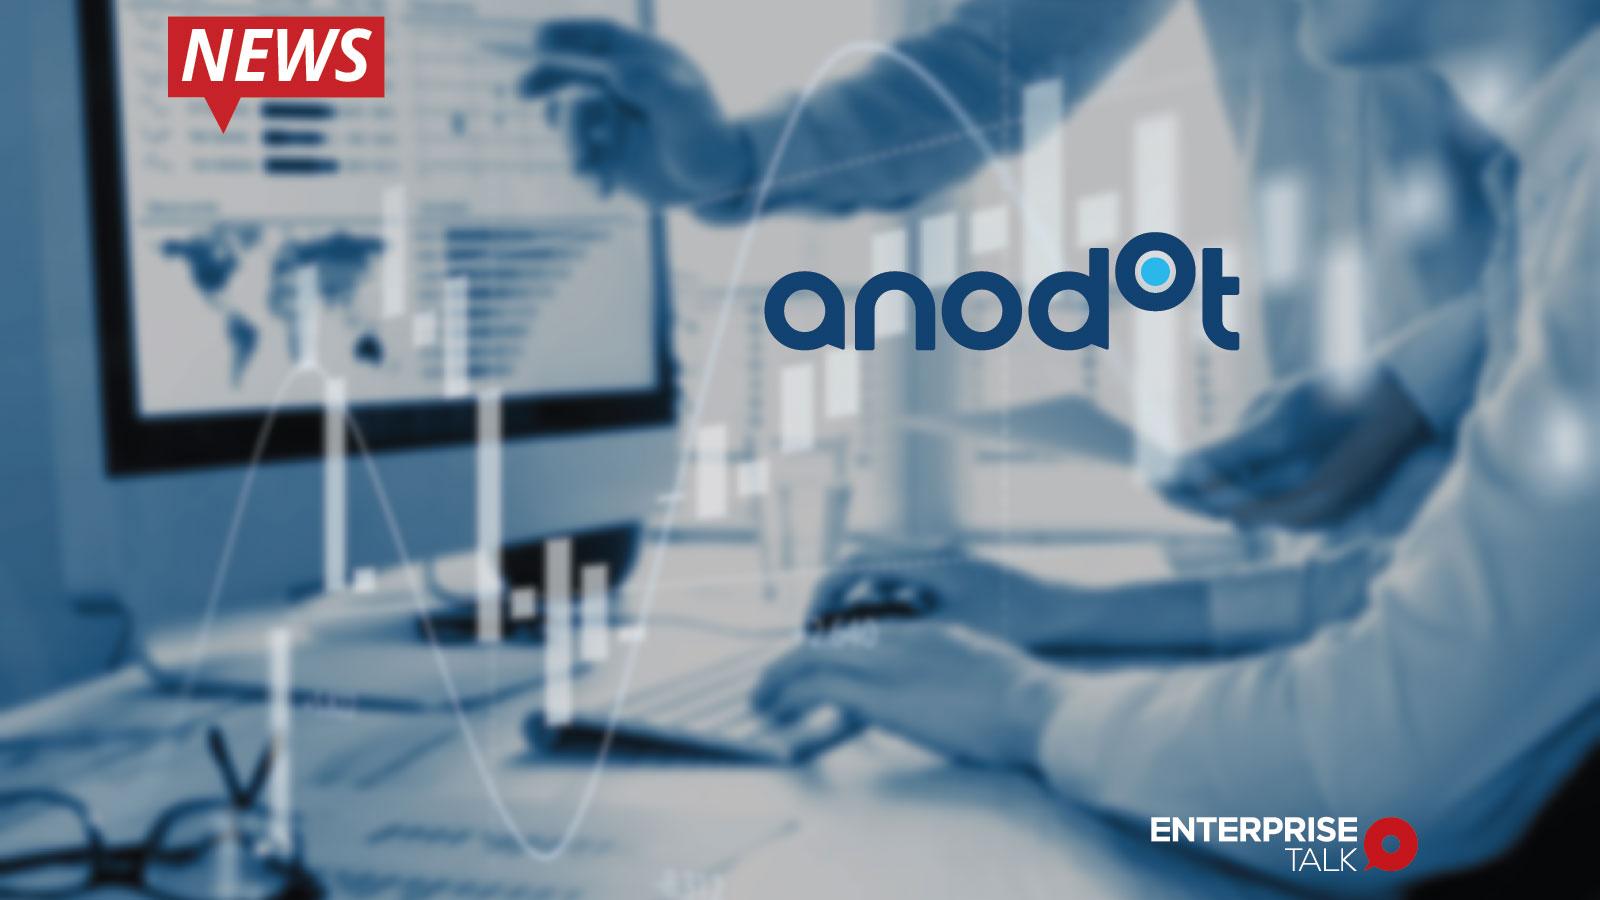 Anodot, AWS, Amazon Web Services, Amazon Simple Storage Service (Amazon S3), Amazon Redshift, Amazon Kinesis, Amazon CloudWatch and Amazon Relational Database Service (Amazon RDS)